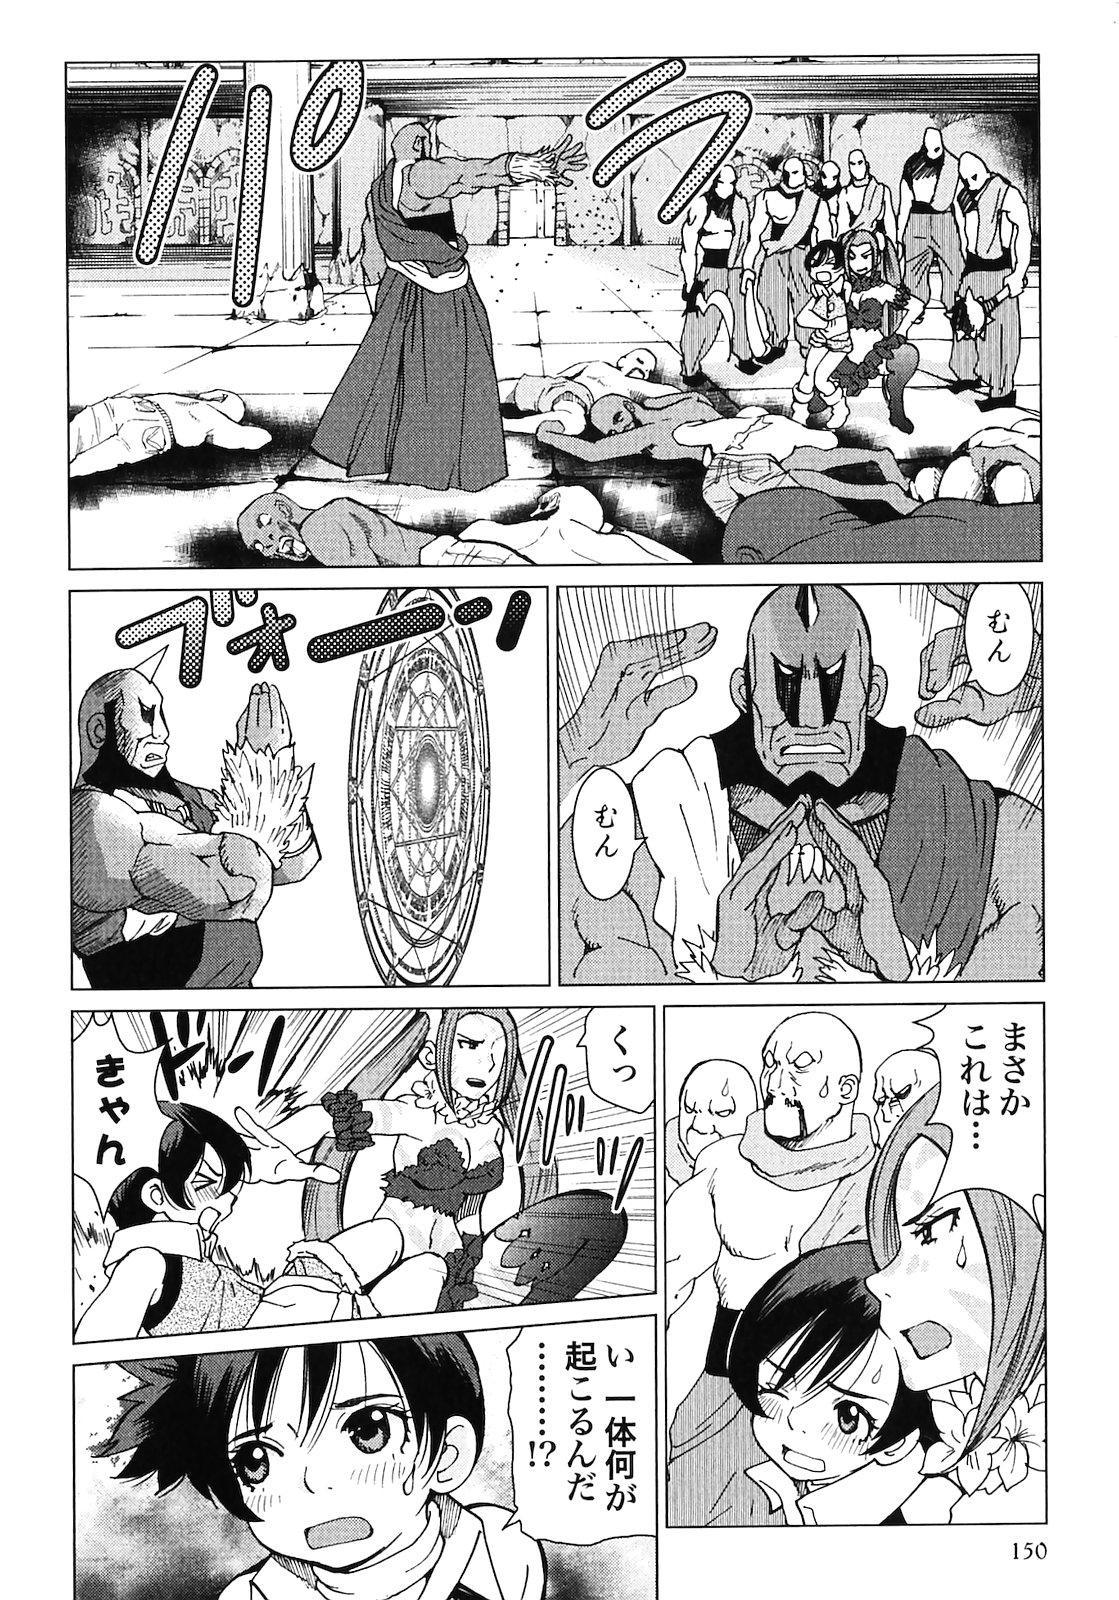 Makyo no Shanana Vol.02 151